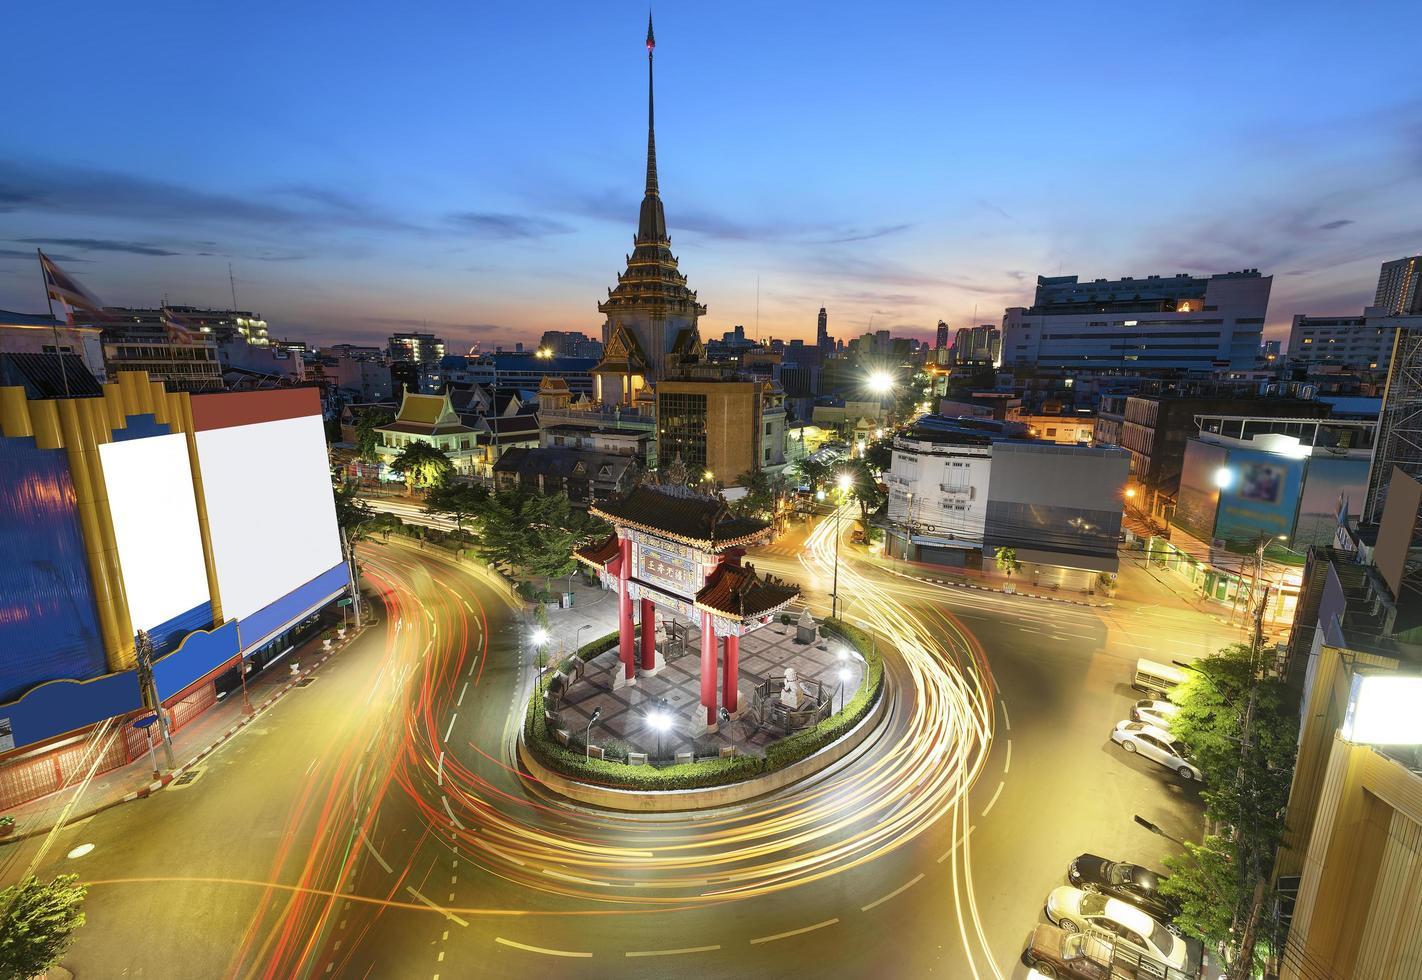 gateway arch och templet i bangkok, thailand foto